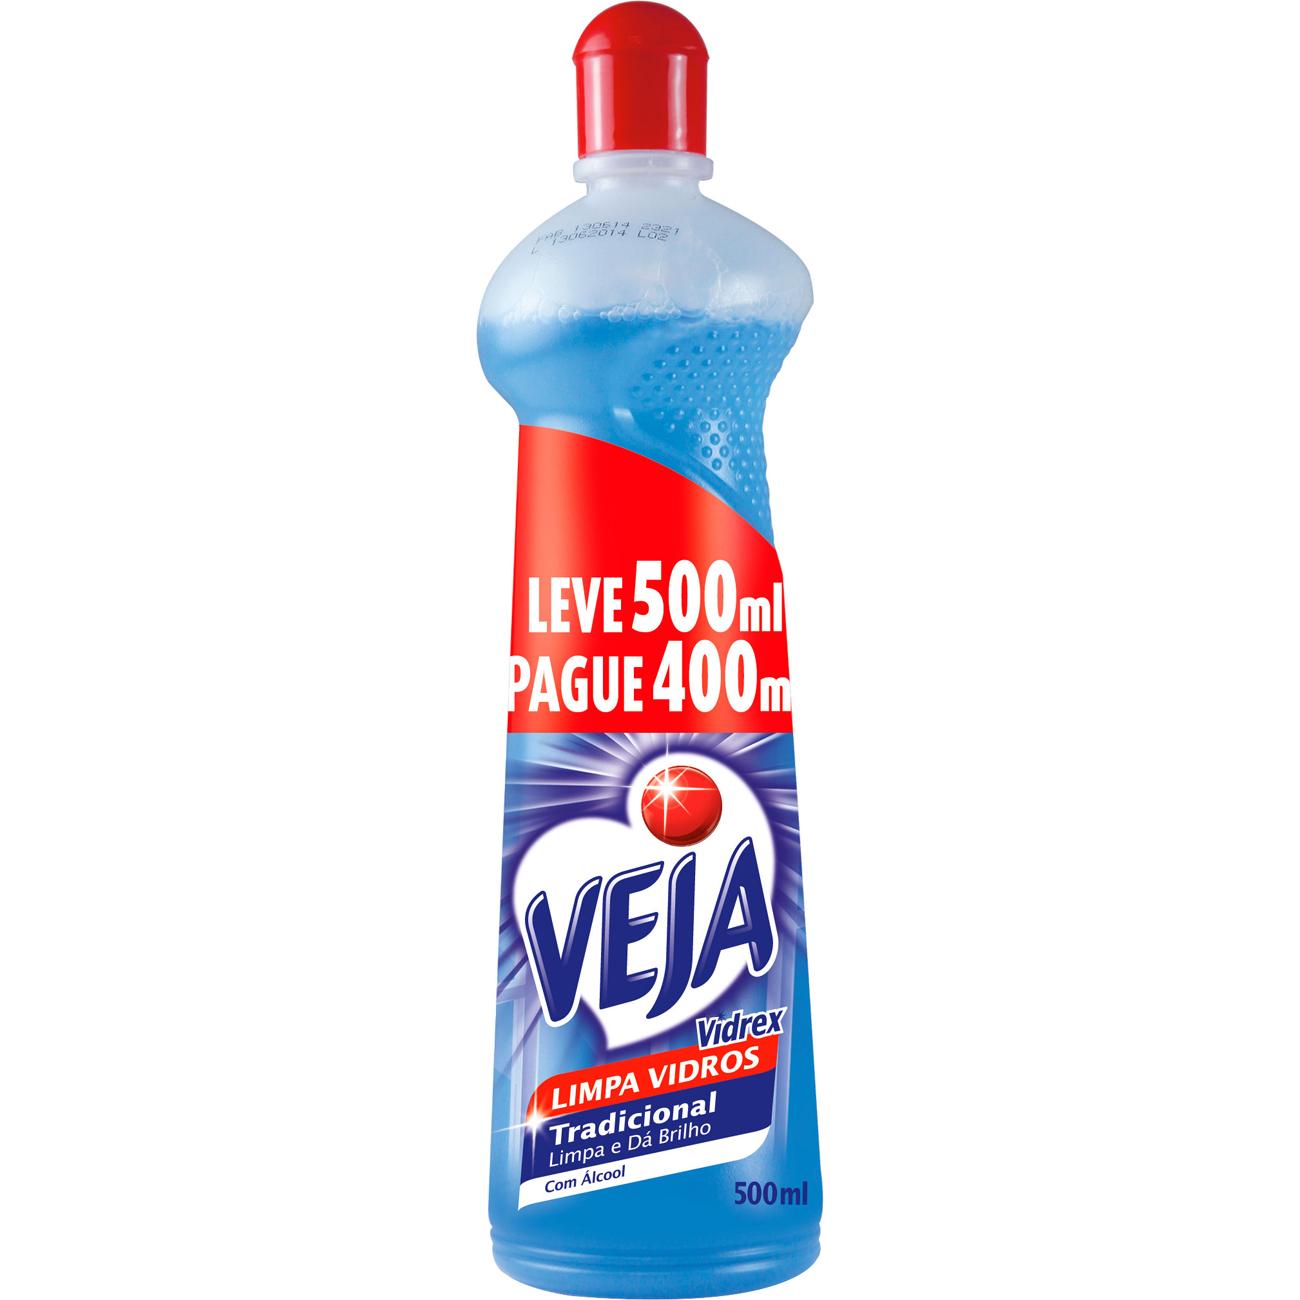 Limpa Vidro Veja Vidrex 500Ml 20% Desconto